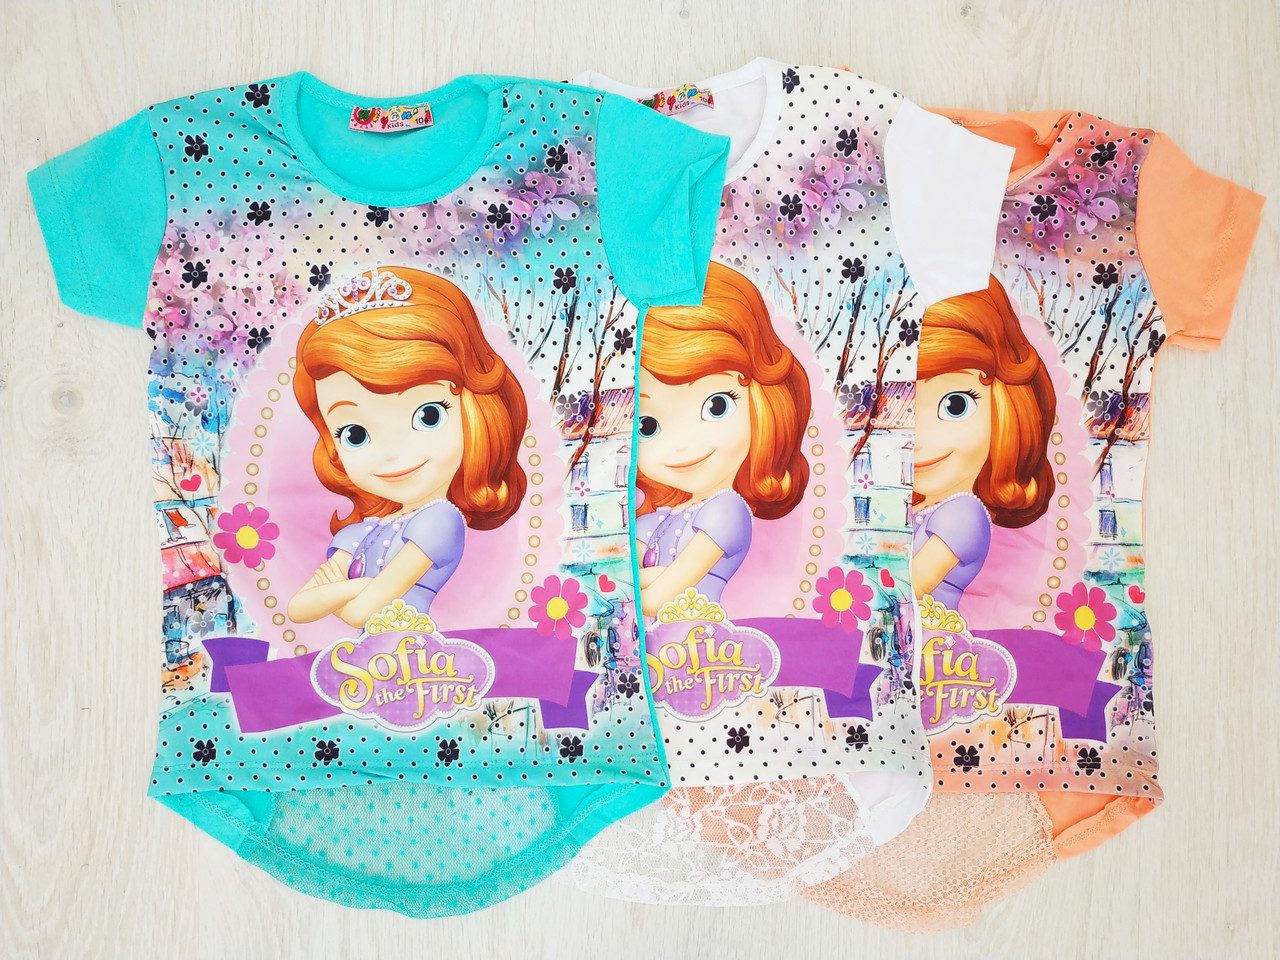 Туника-футболка для девочки, Турция, Babexi, арт. 3816